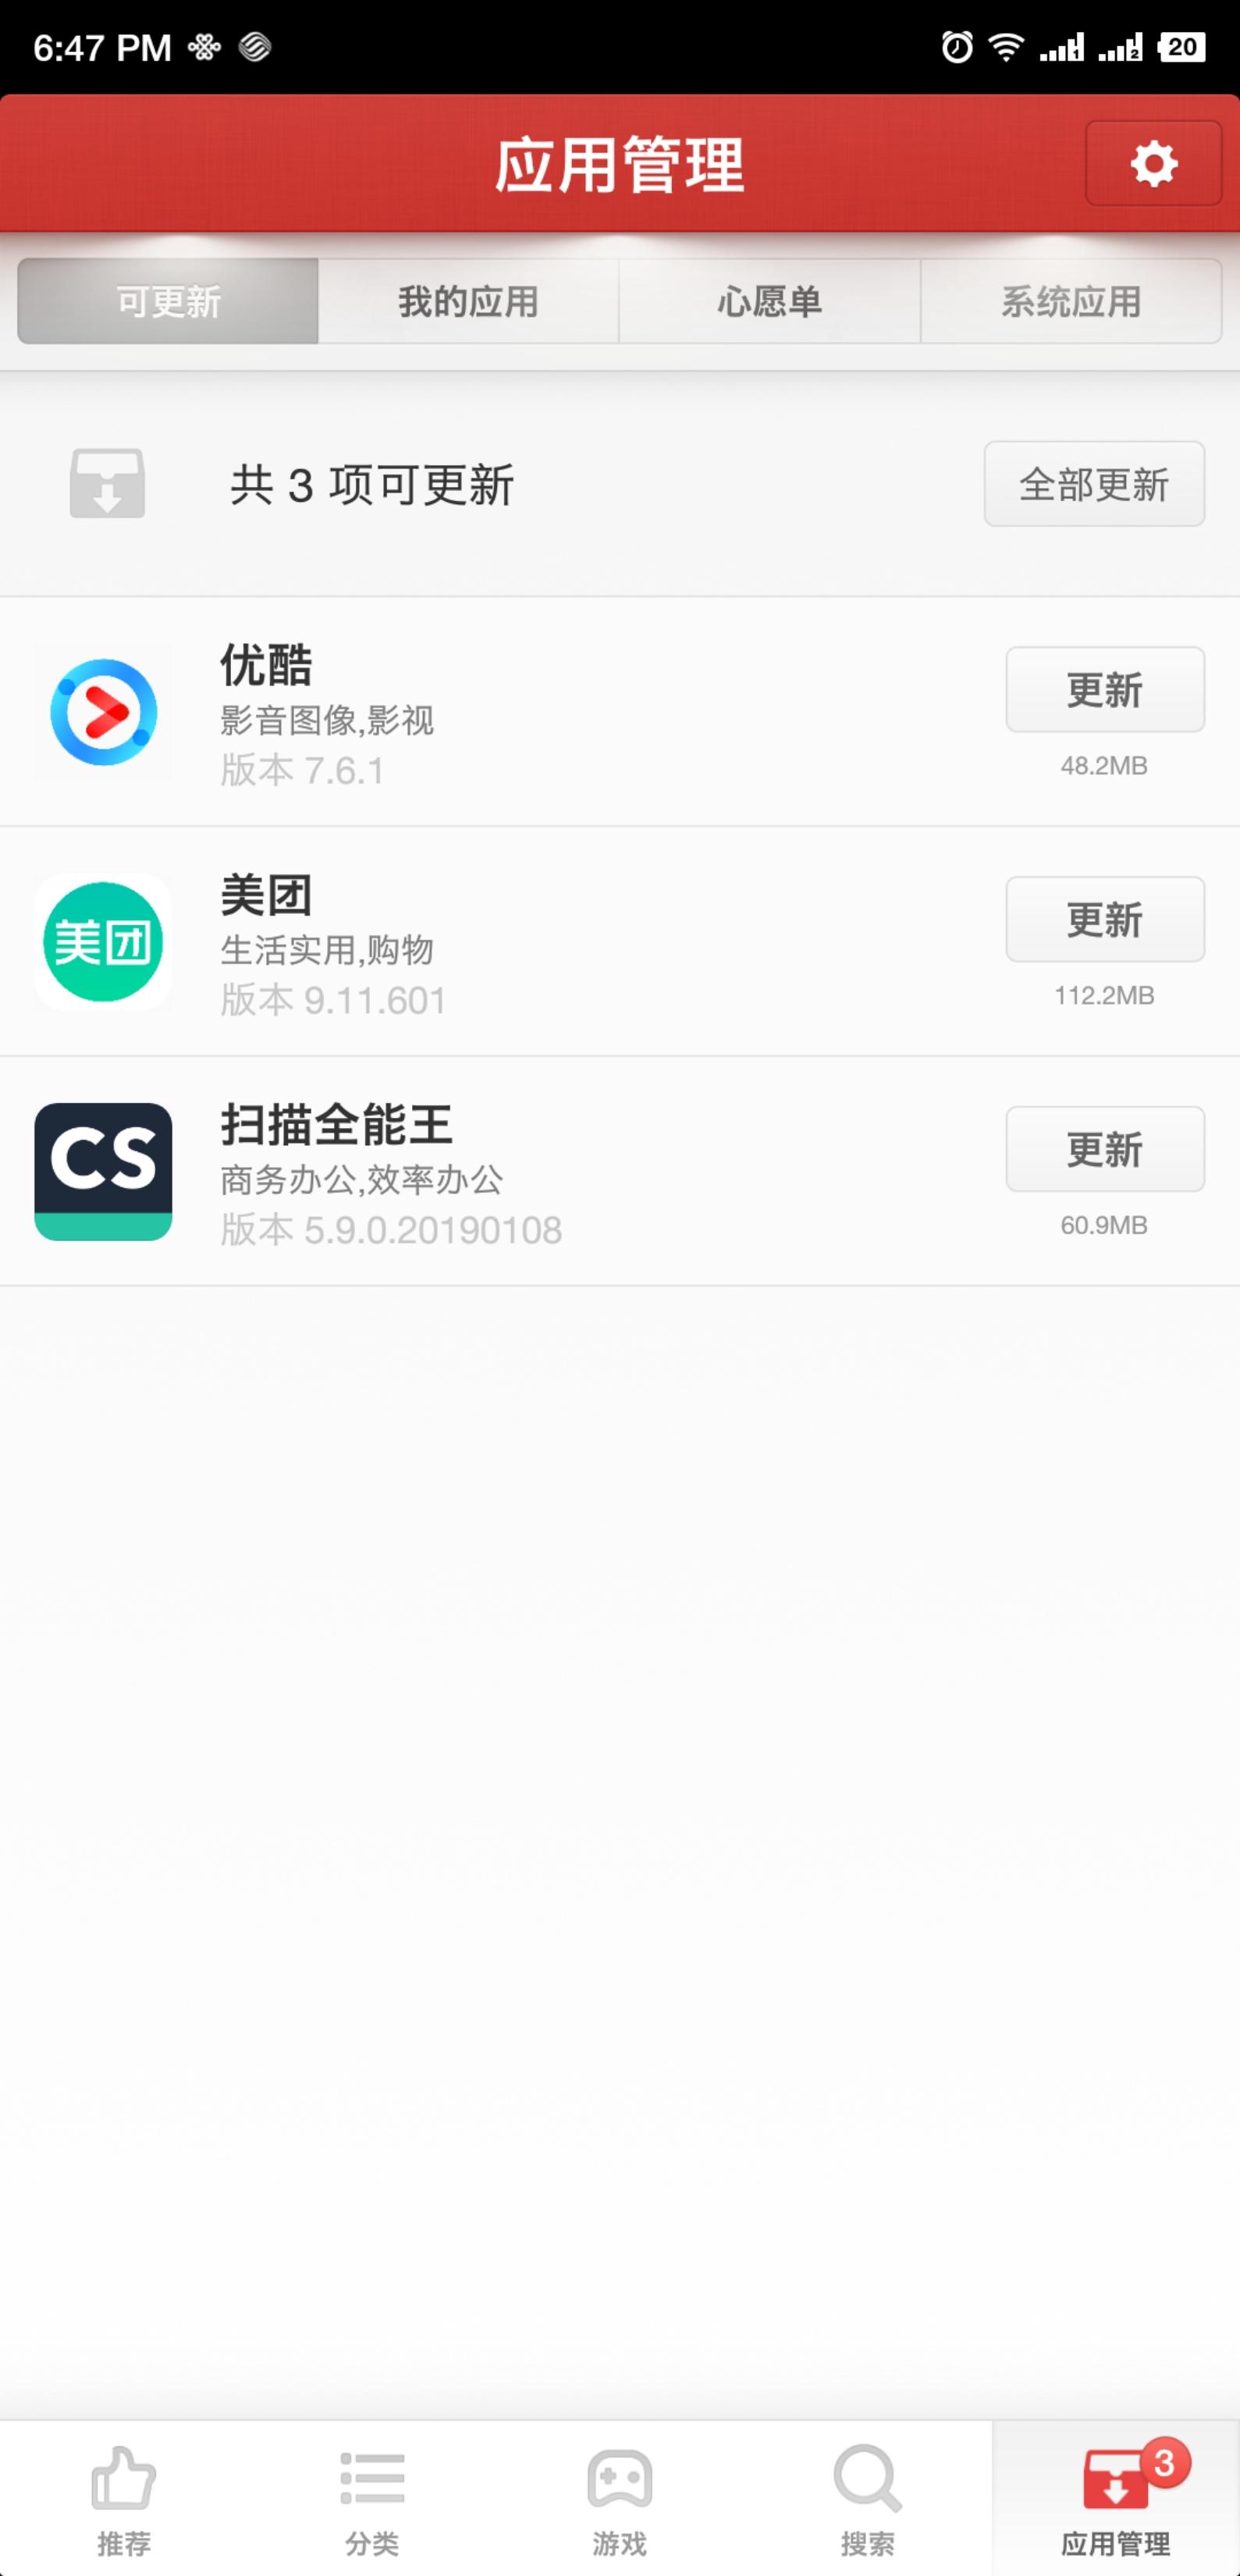 Screenshot_2019-01-16-18-48-00-141_????.png